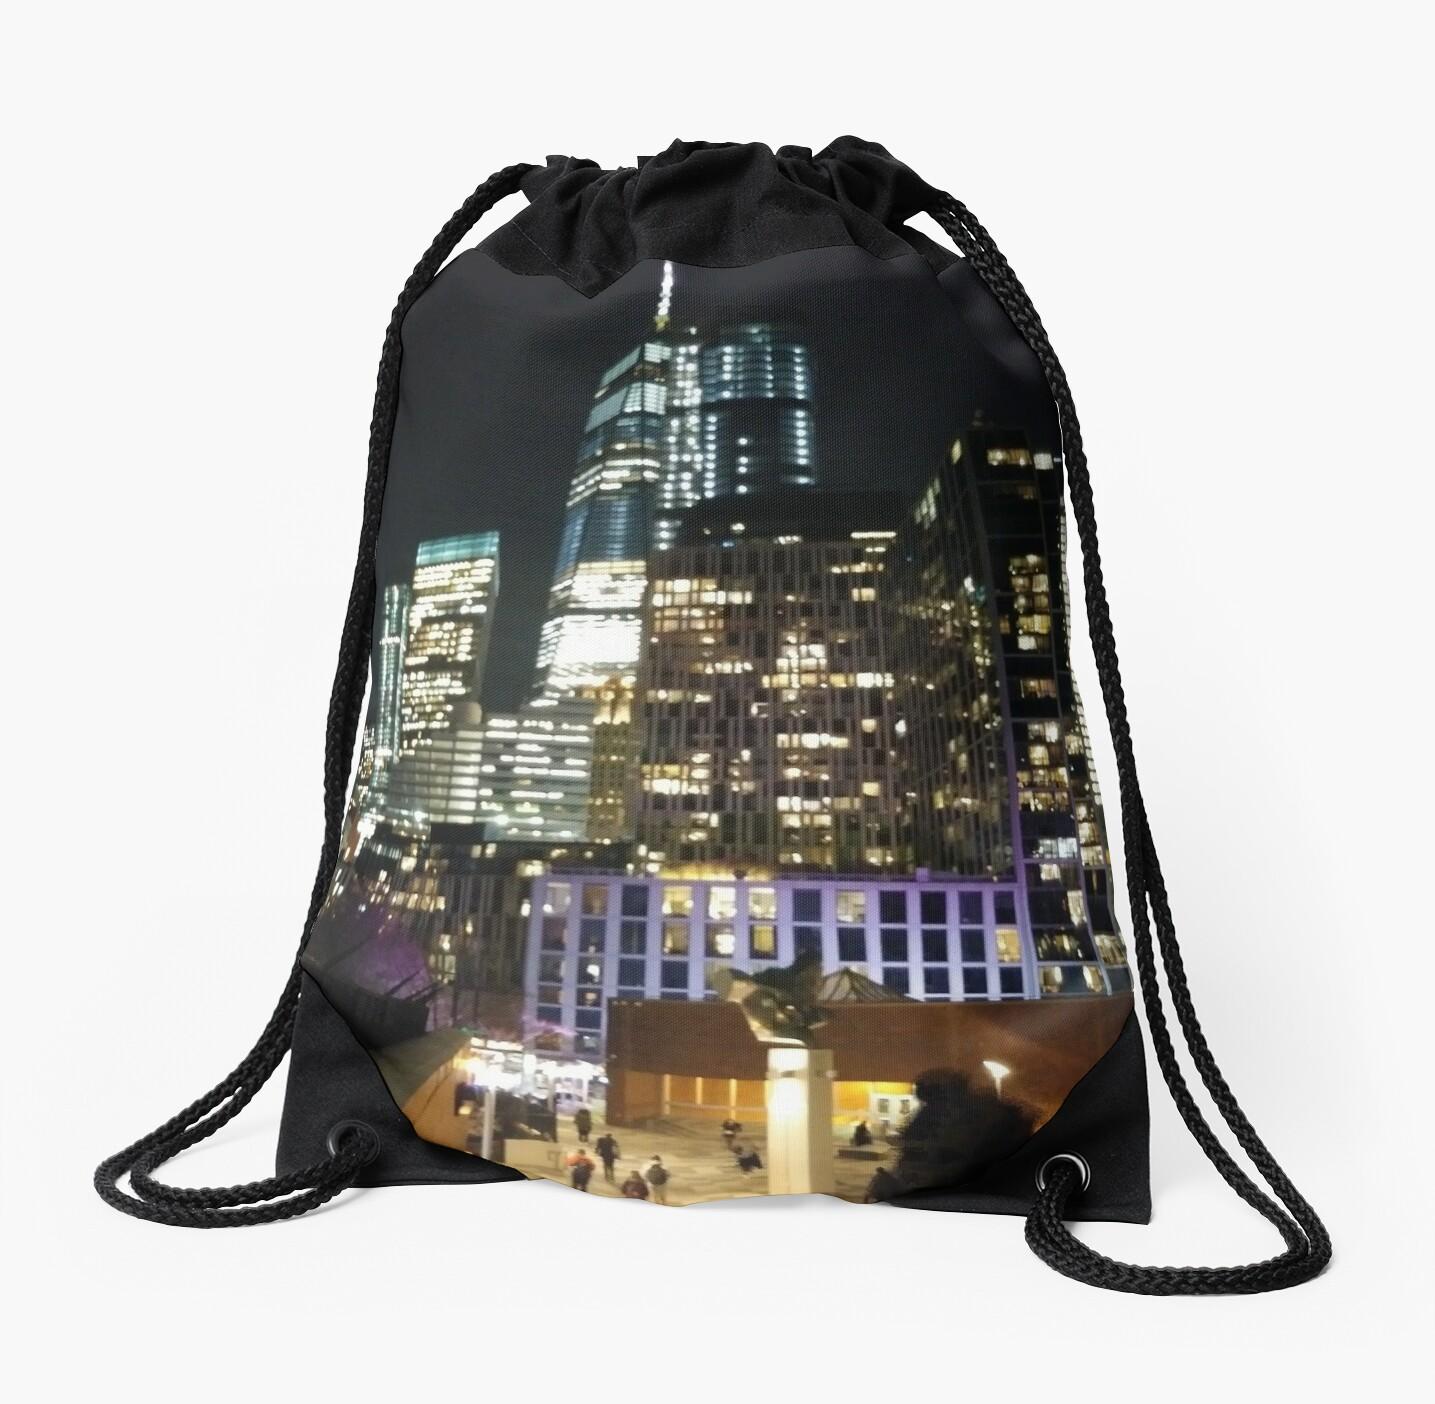 New York, Brooklyn, Manhattan, New York City, Buildings, streets, trees by znamenski